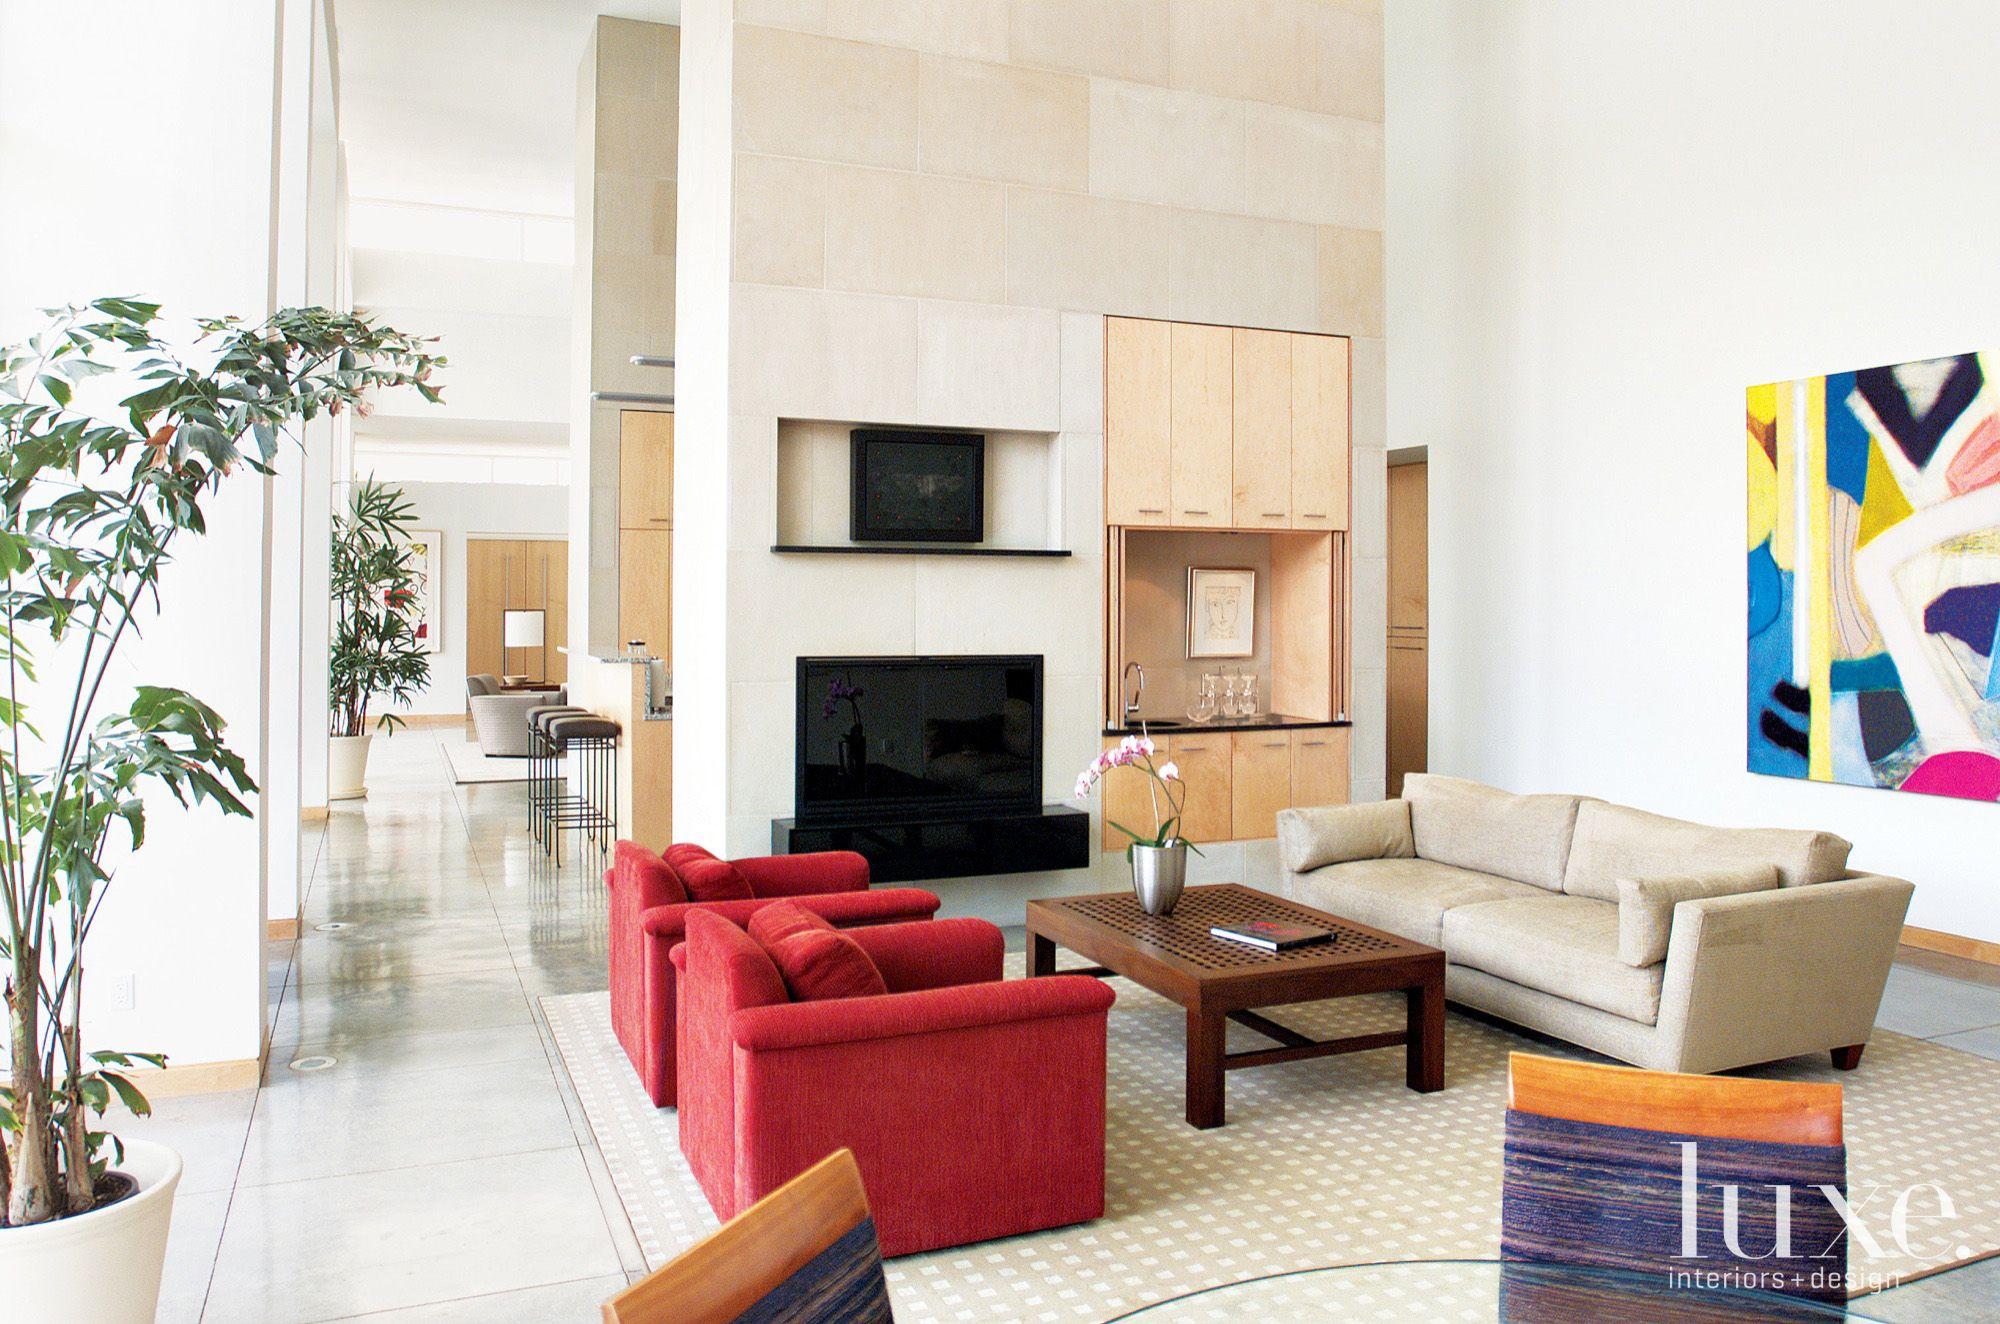 Modern White Den with Limestone Fireplace Surround